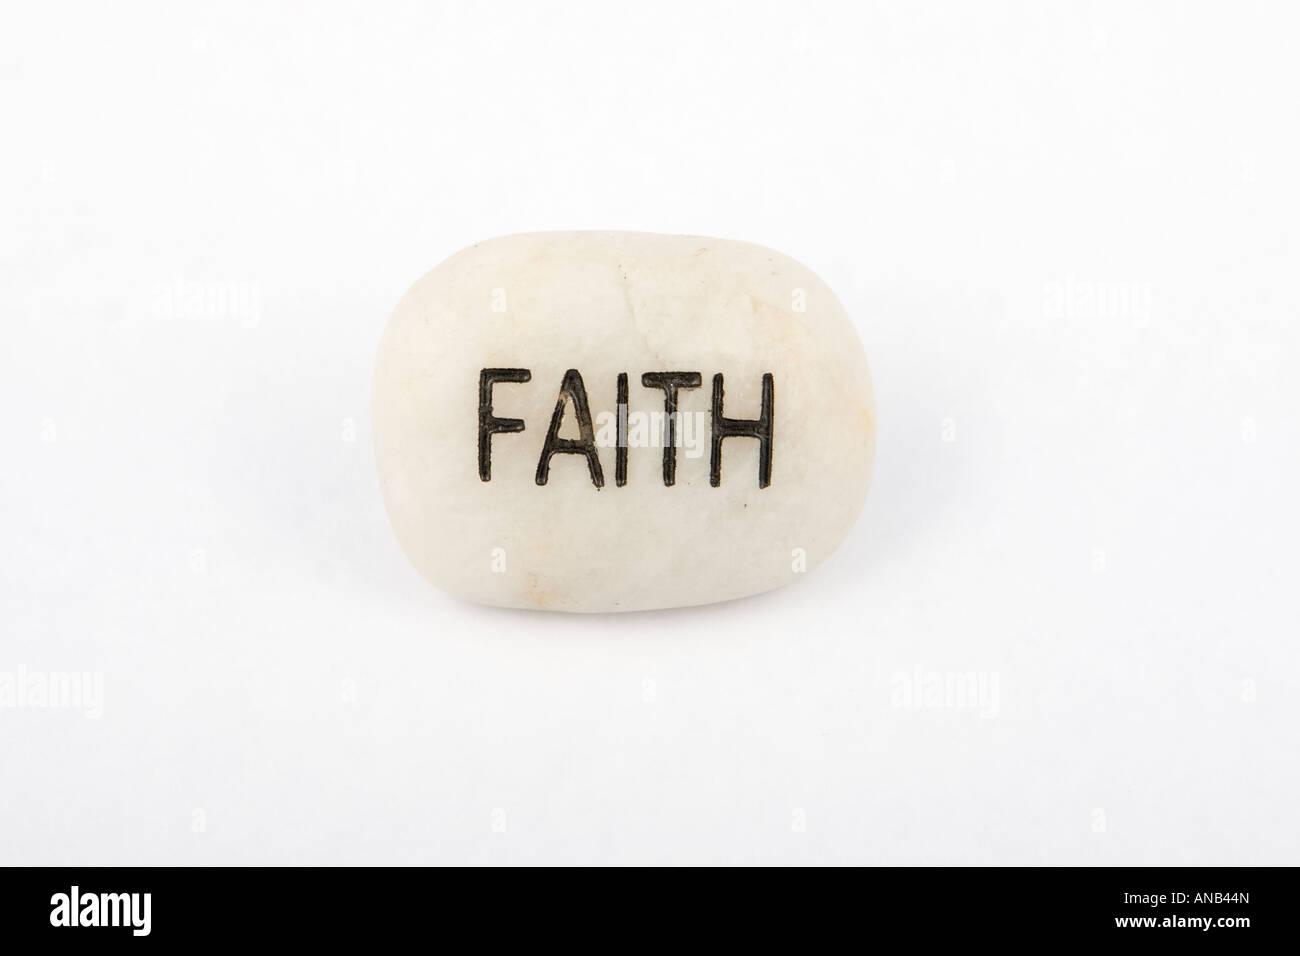 Word on stone: Faith - Stock Image